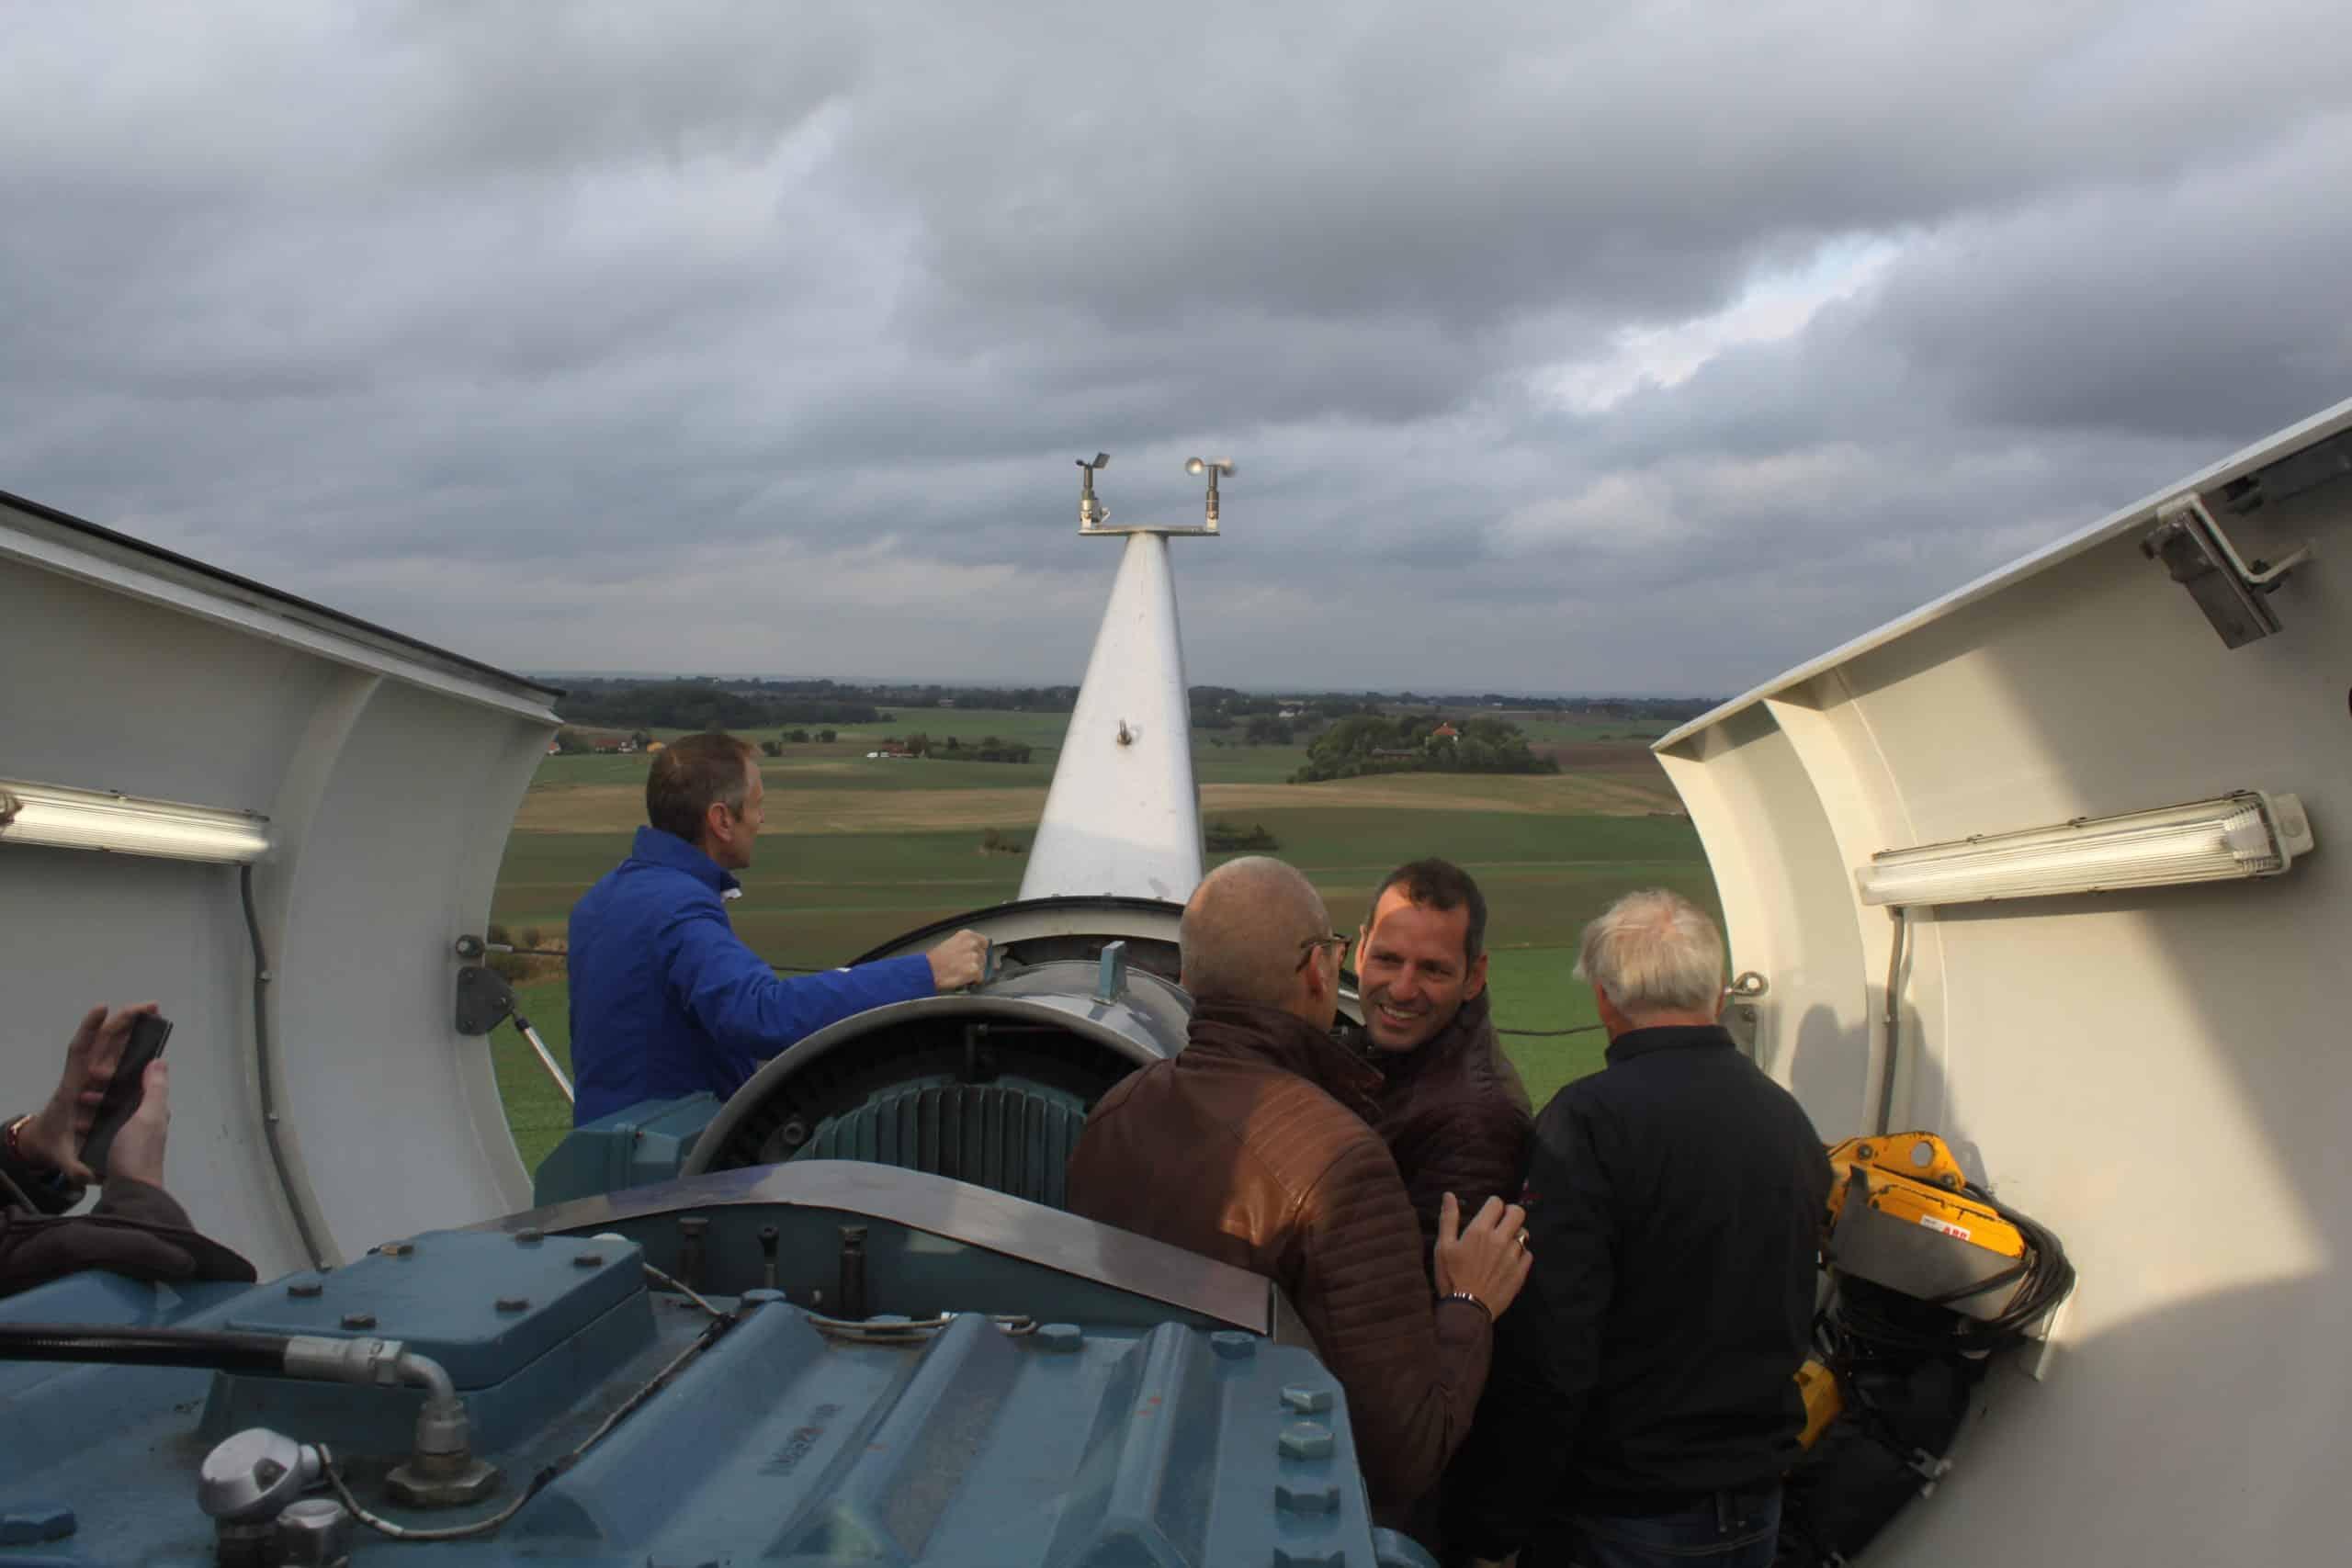 Samsø enthousiaste TVVL-ers in lokale windmolen